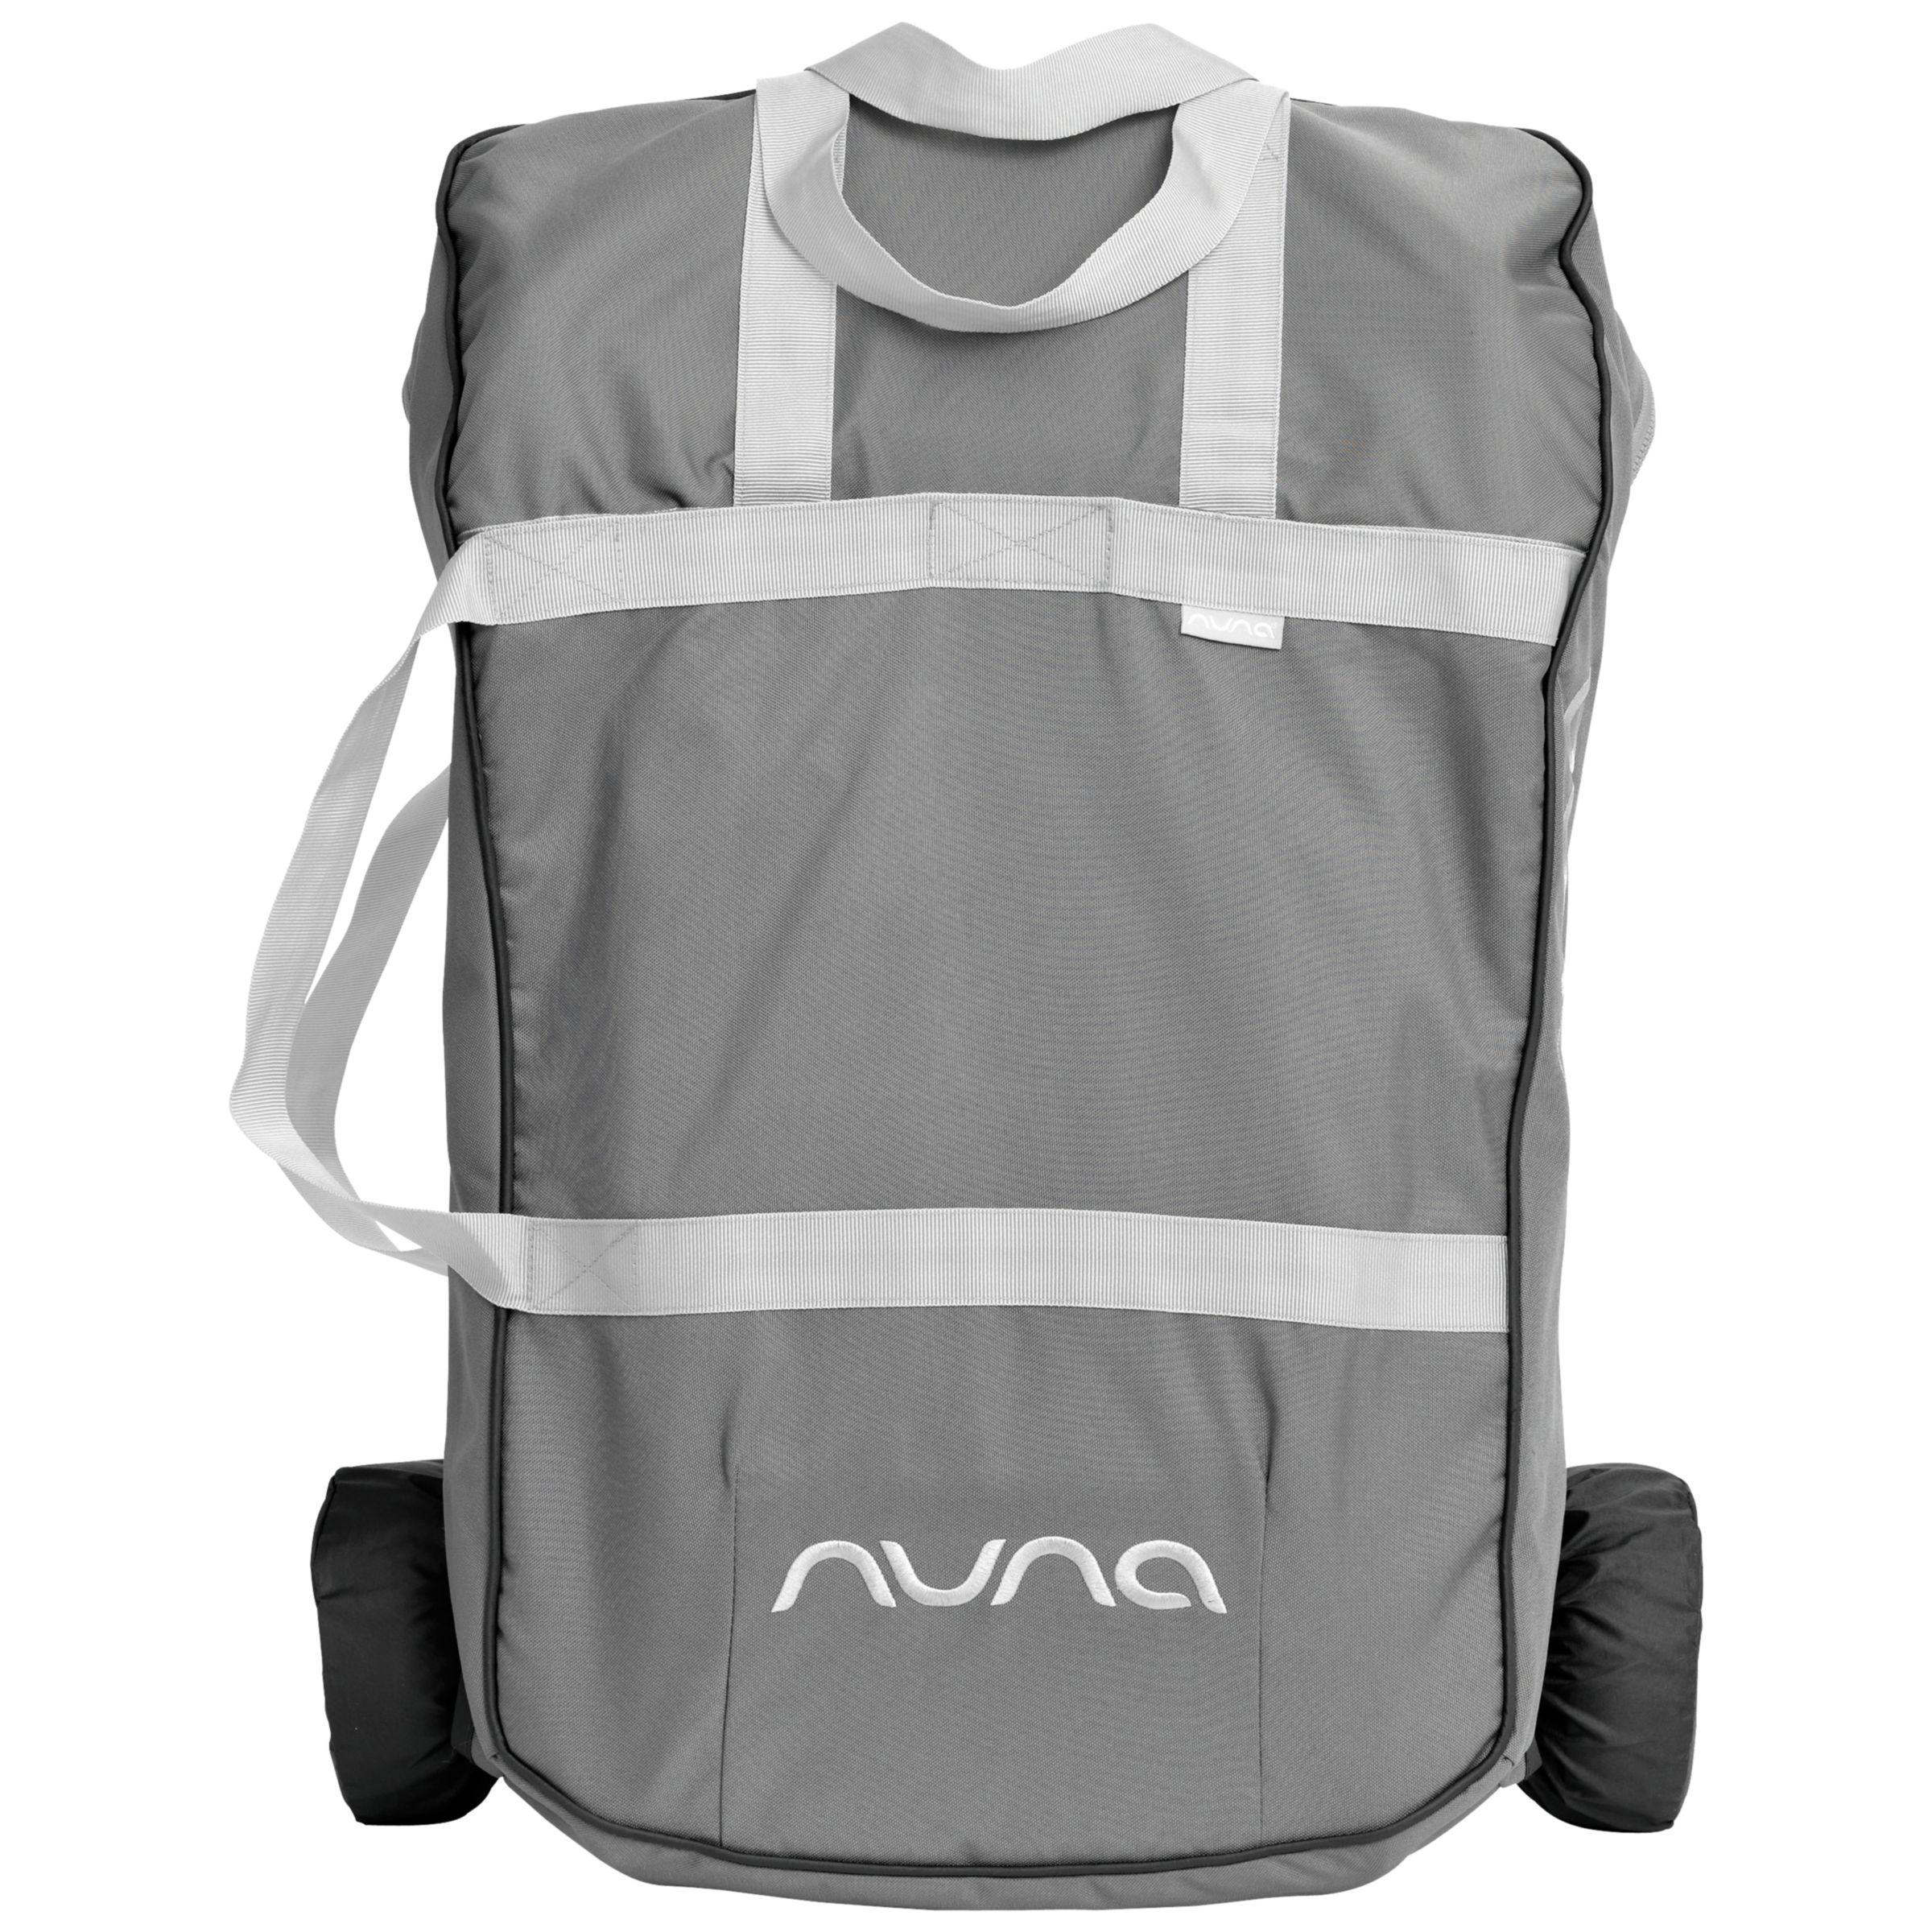 Nuna Nuna Luxx Transport Bag, Grey